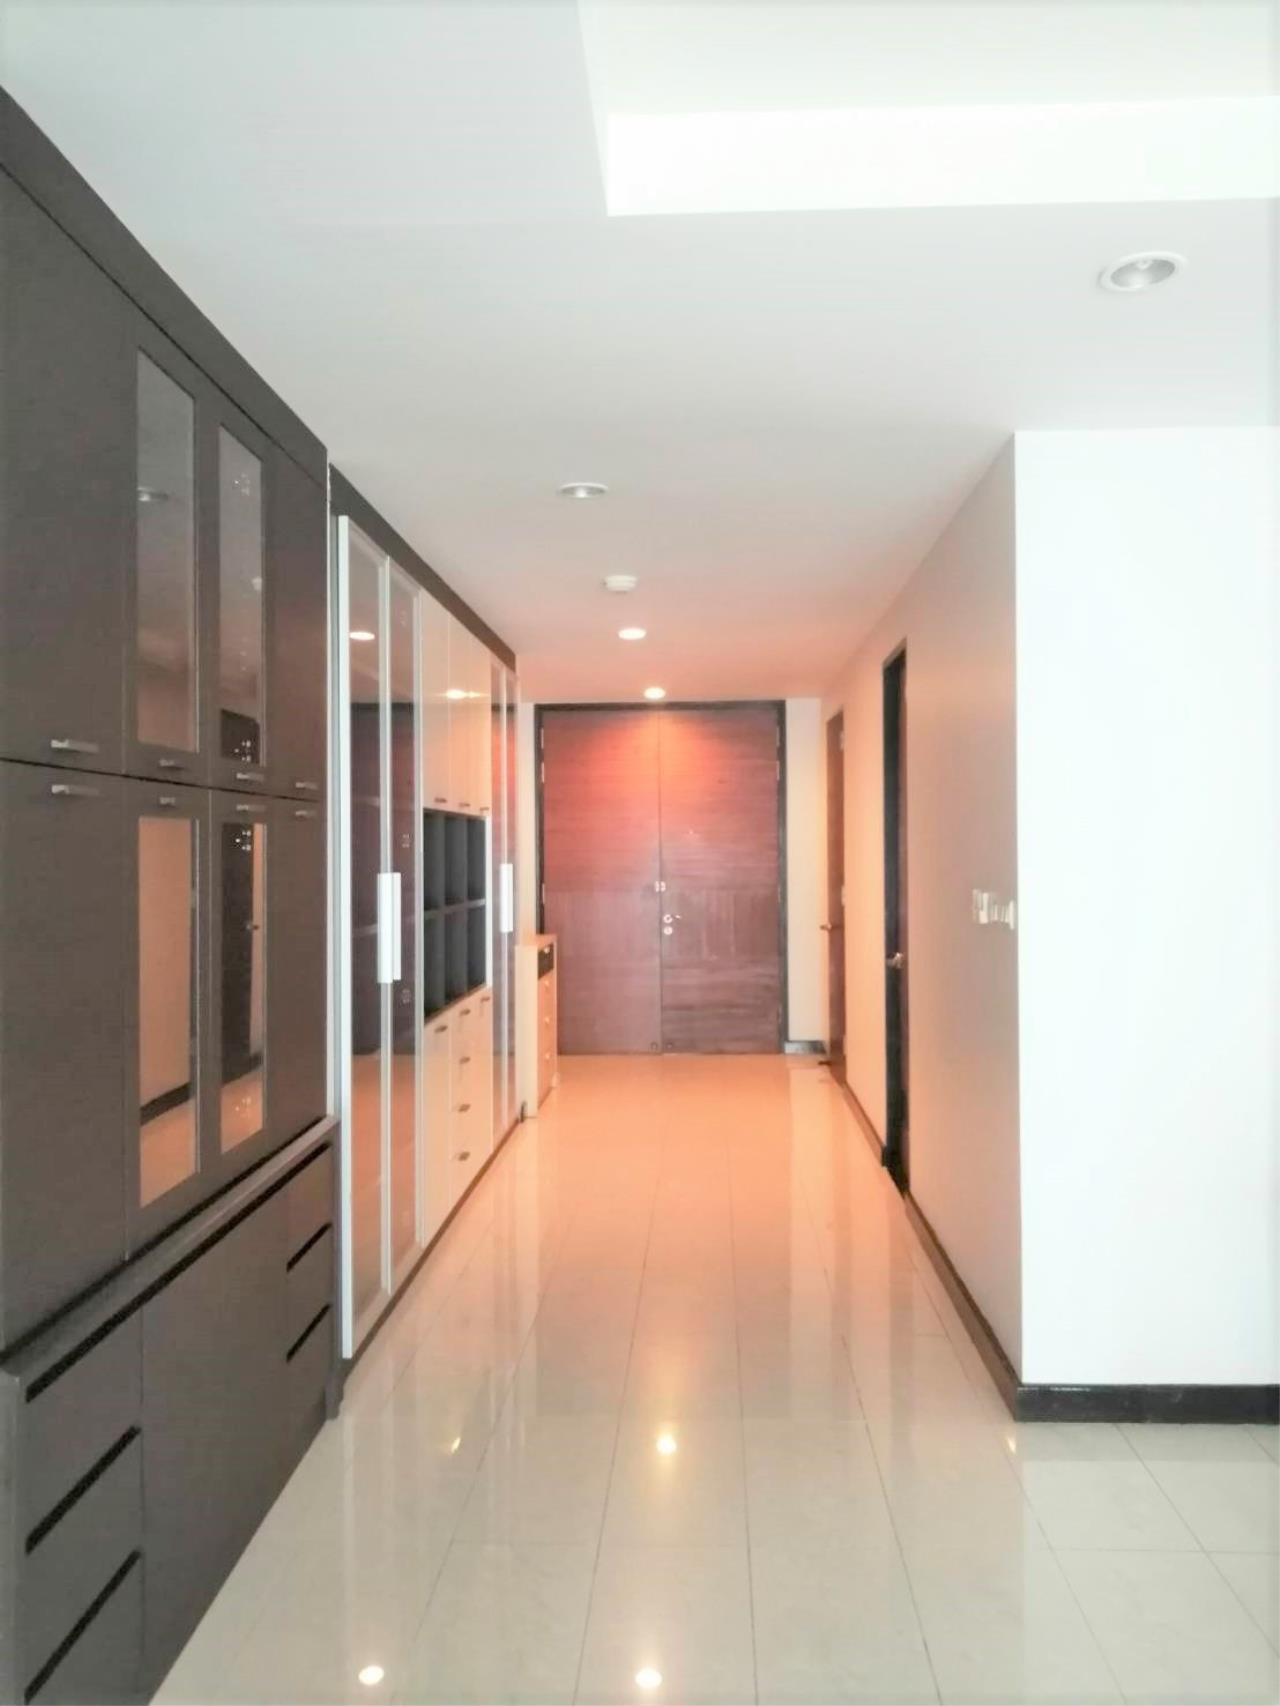 Blueocean property Agency's Condo For Rent – Avenue 61 Condominium 6